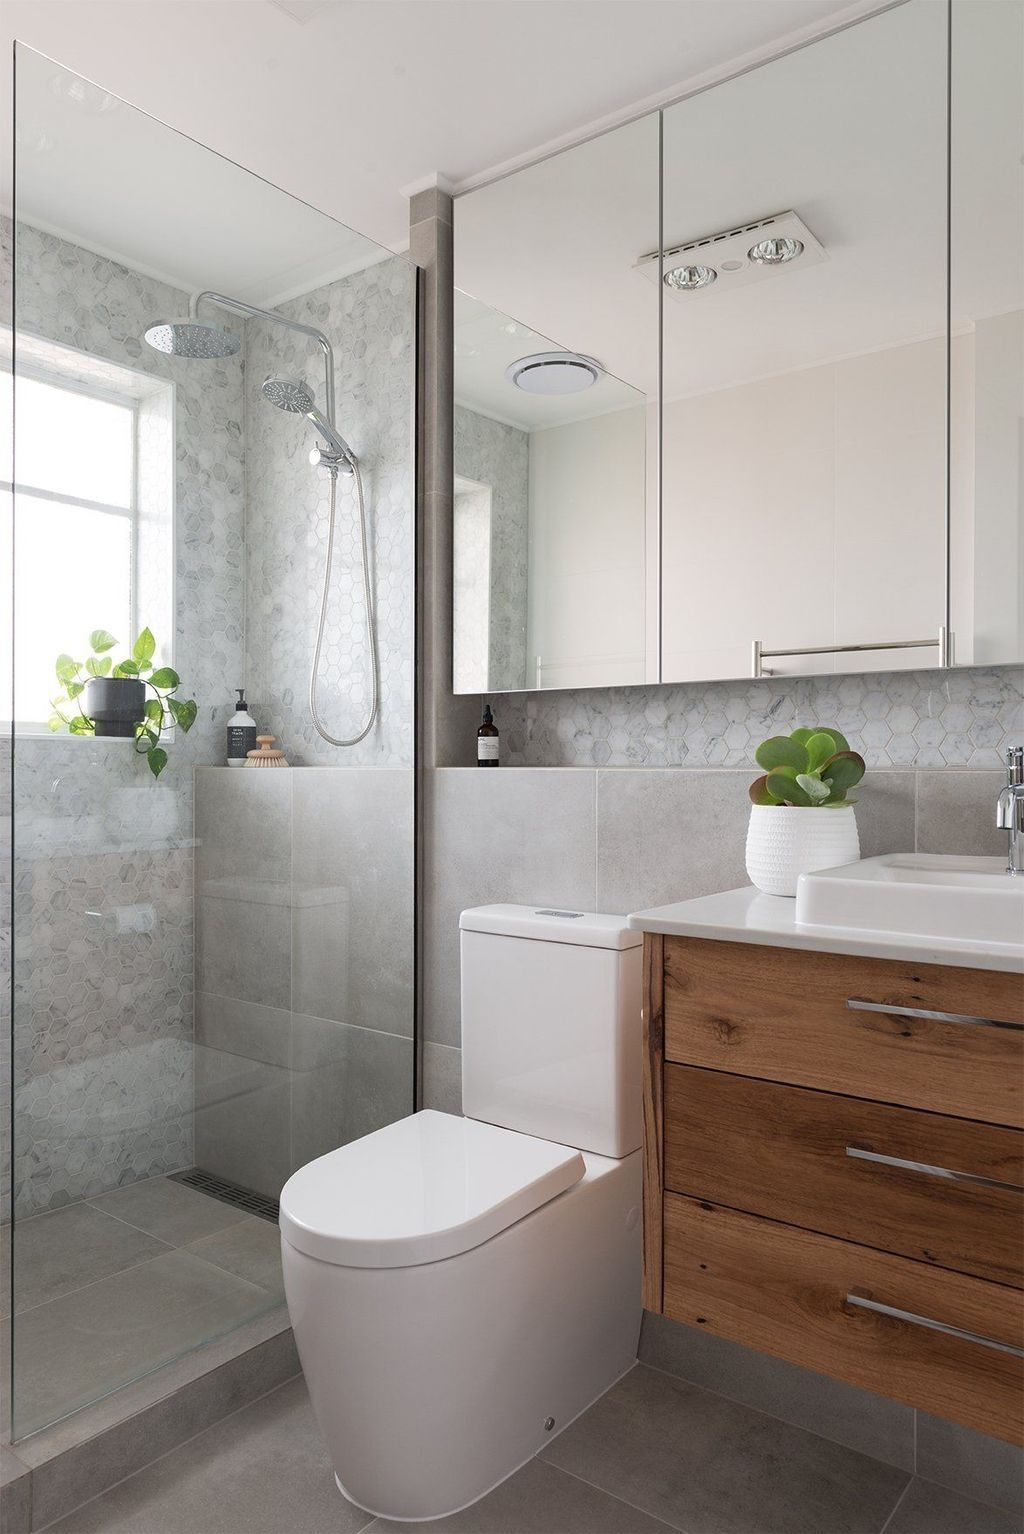 30 Brilliant Bathroom Design Ideas For Small Space Modern Bathroom Renovations Modern Bathroom Concrete Bathroom